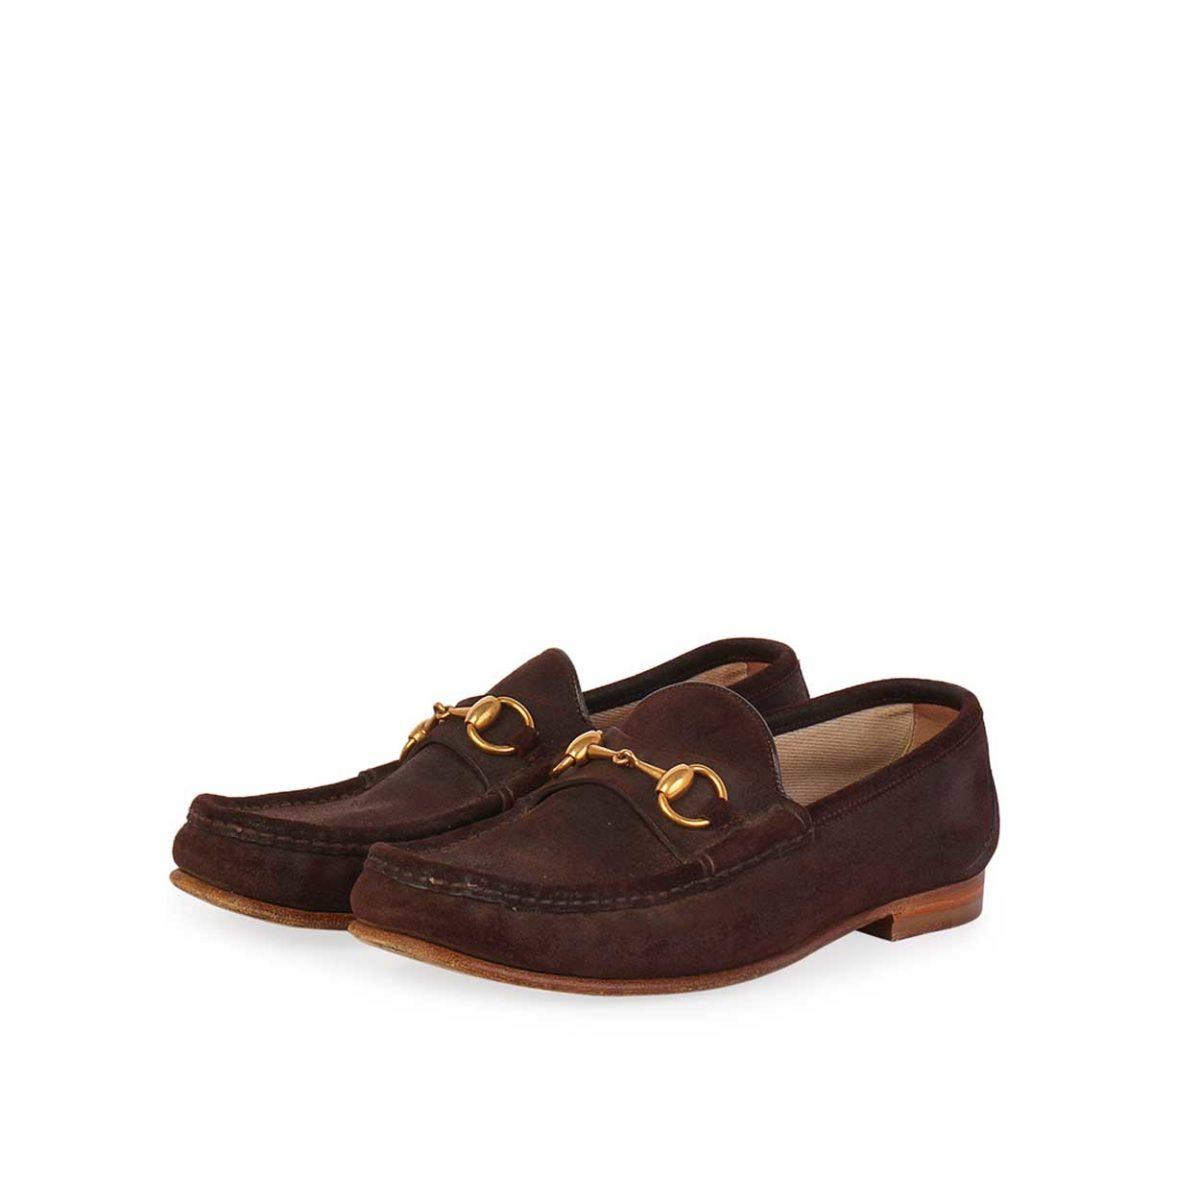 d333e3deb56 GUCCI Vintage Horsebit Suede Loafers Dark Brown - S  40 (6.5)